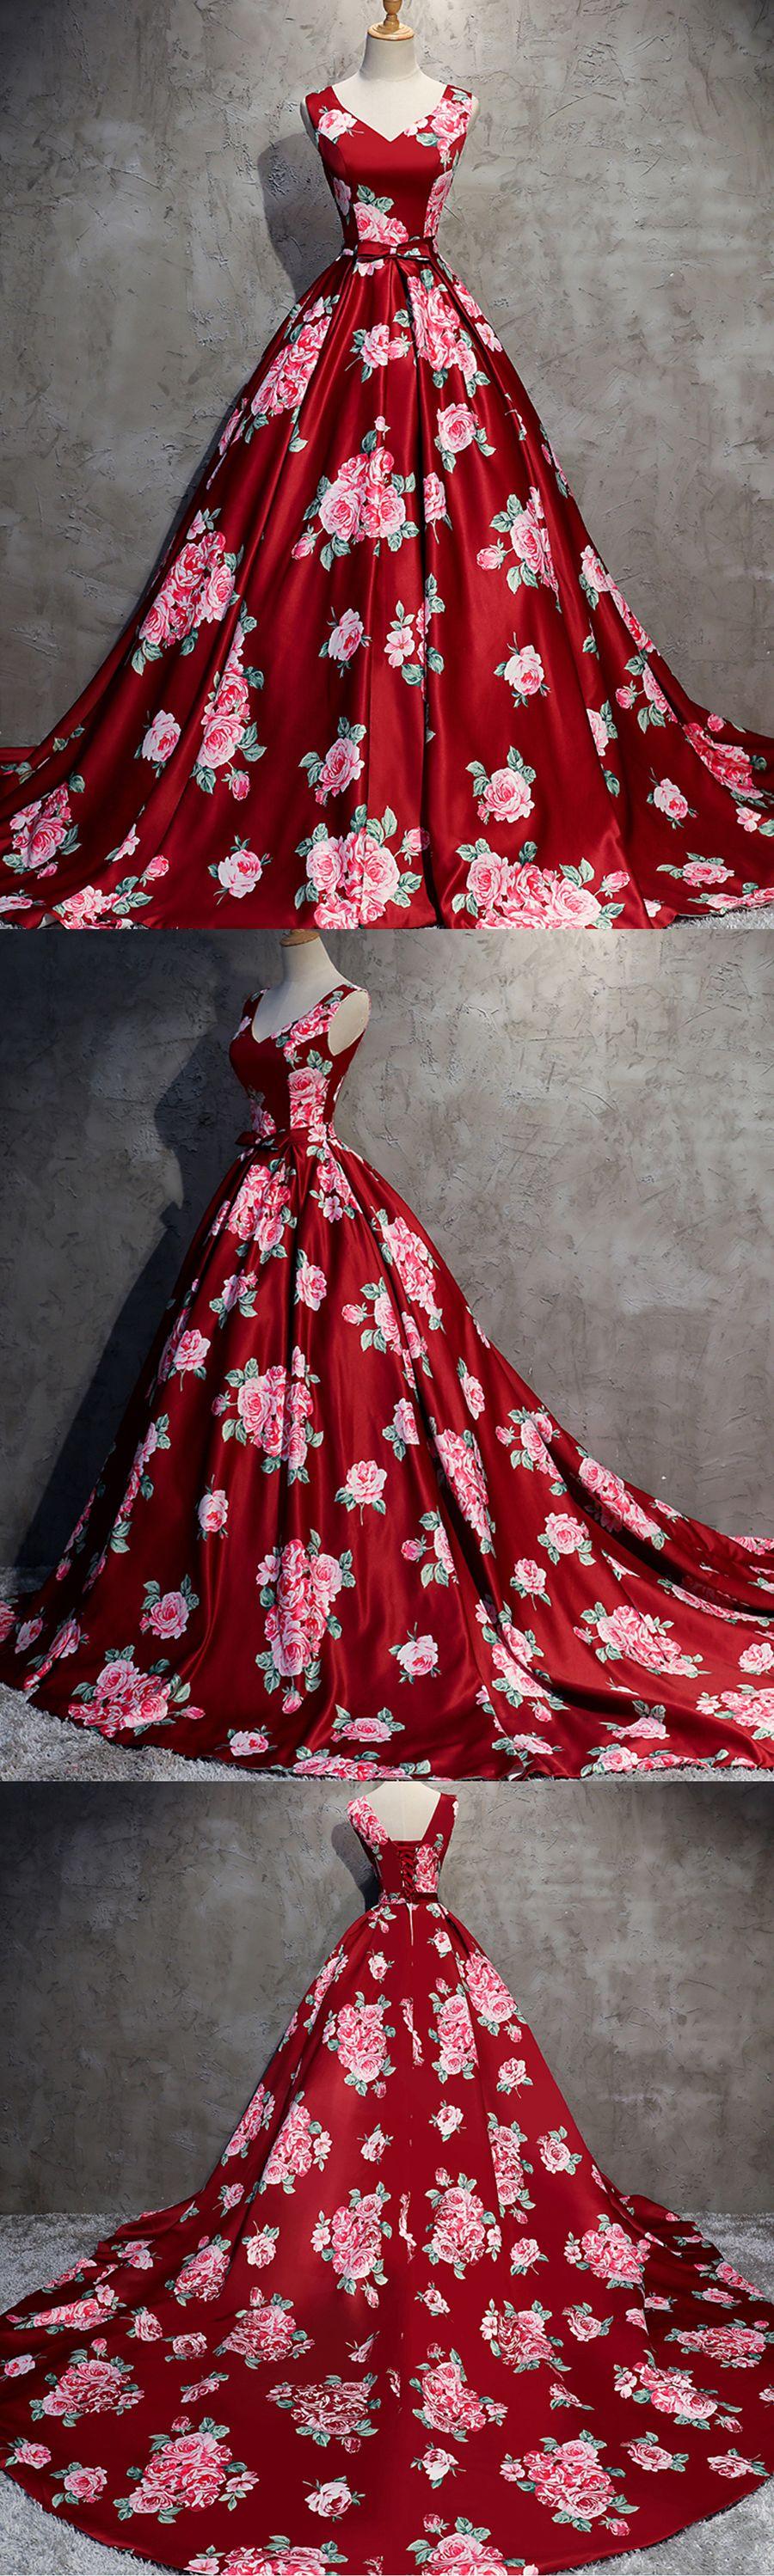 Red floral print satin v neck long train evening dress red floral